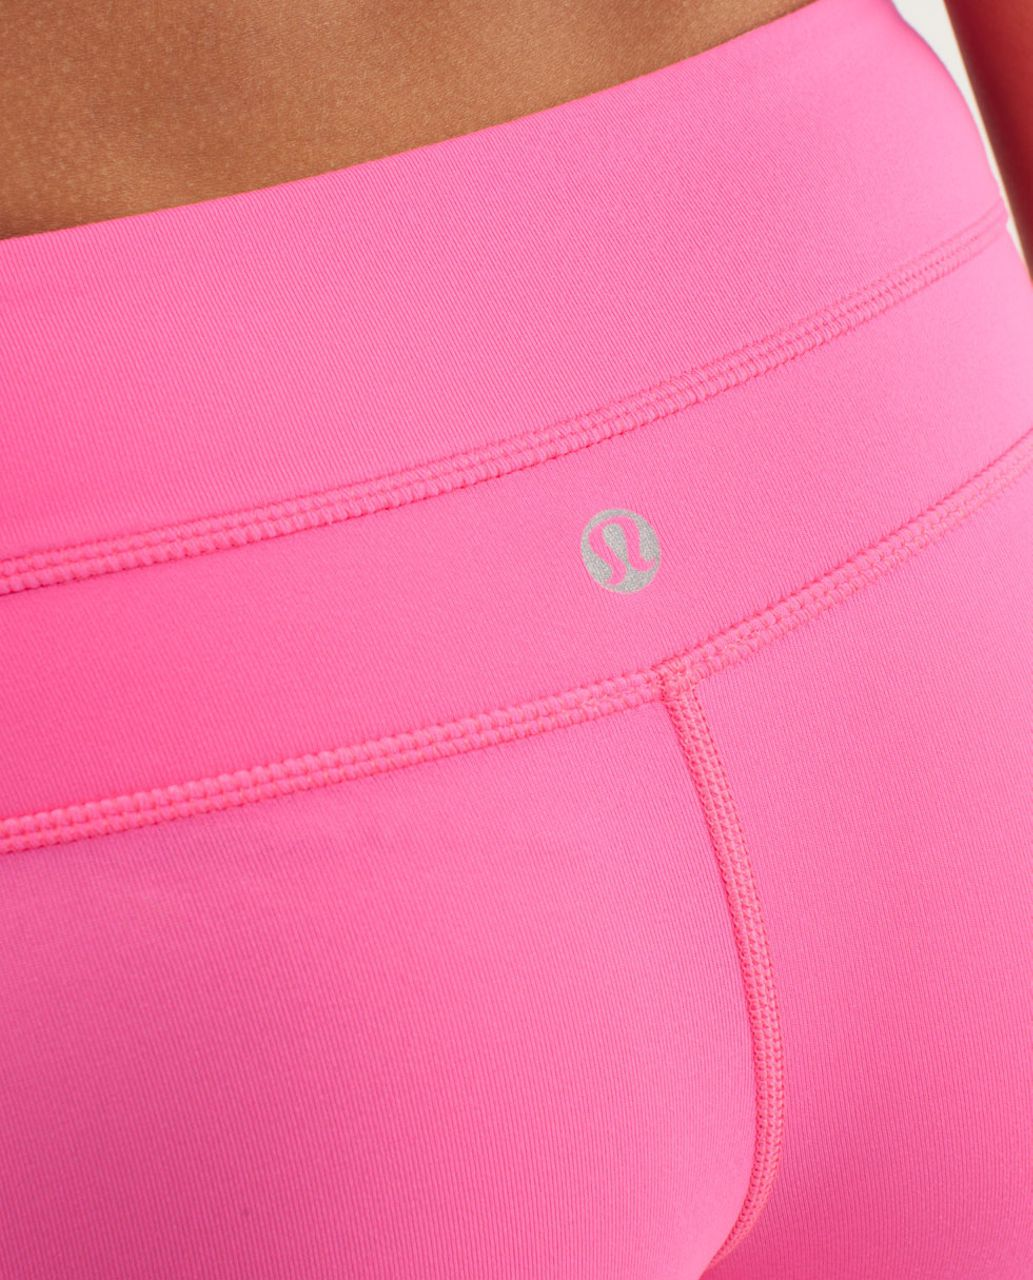 Lululemon Reverse Groove Short (Tall) - Parfait Pink / Pinkelicious